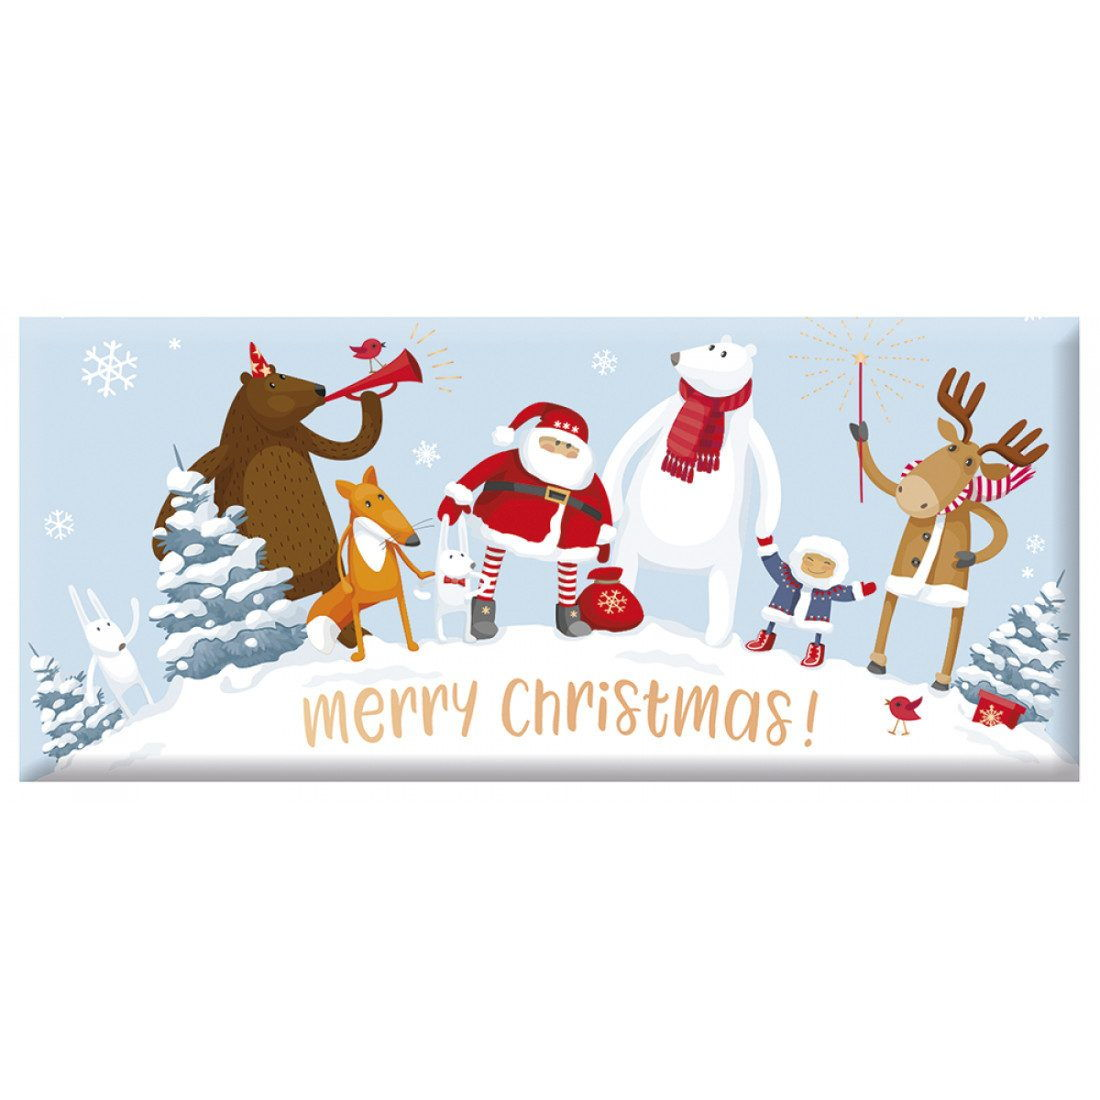 Schoko - Merry Christmas, Santa & Freunde